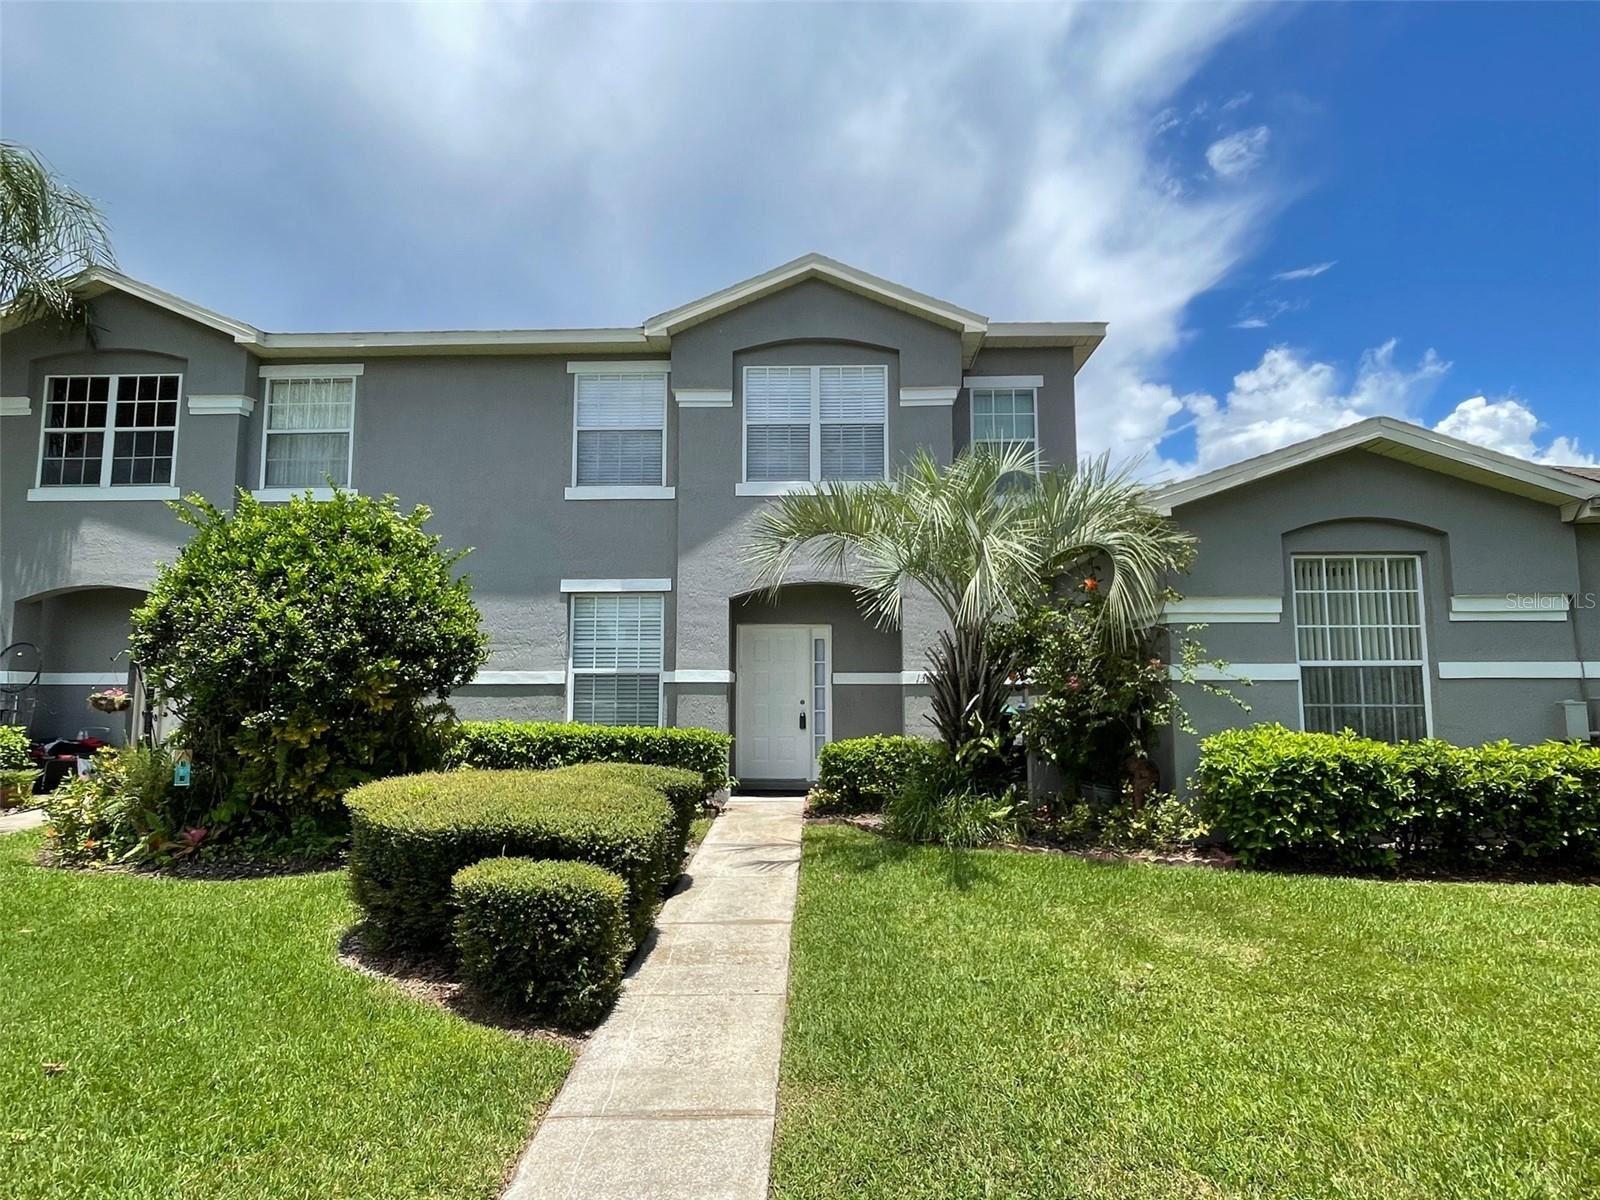 13206 SUMMERTON DRIVE, Orlando, FL 32824 - #: S5053724